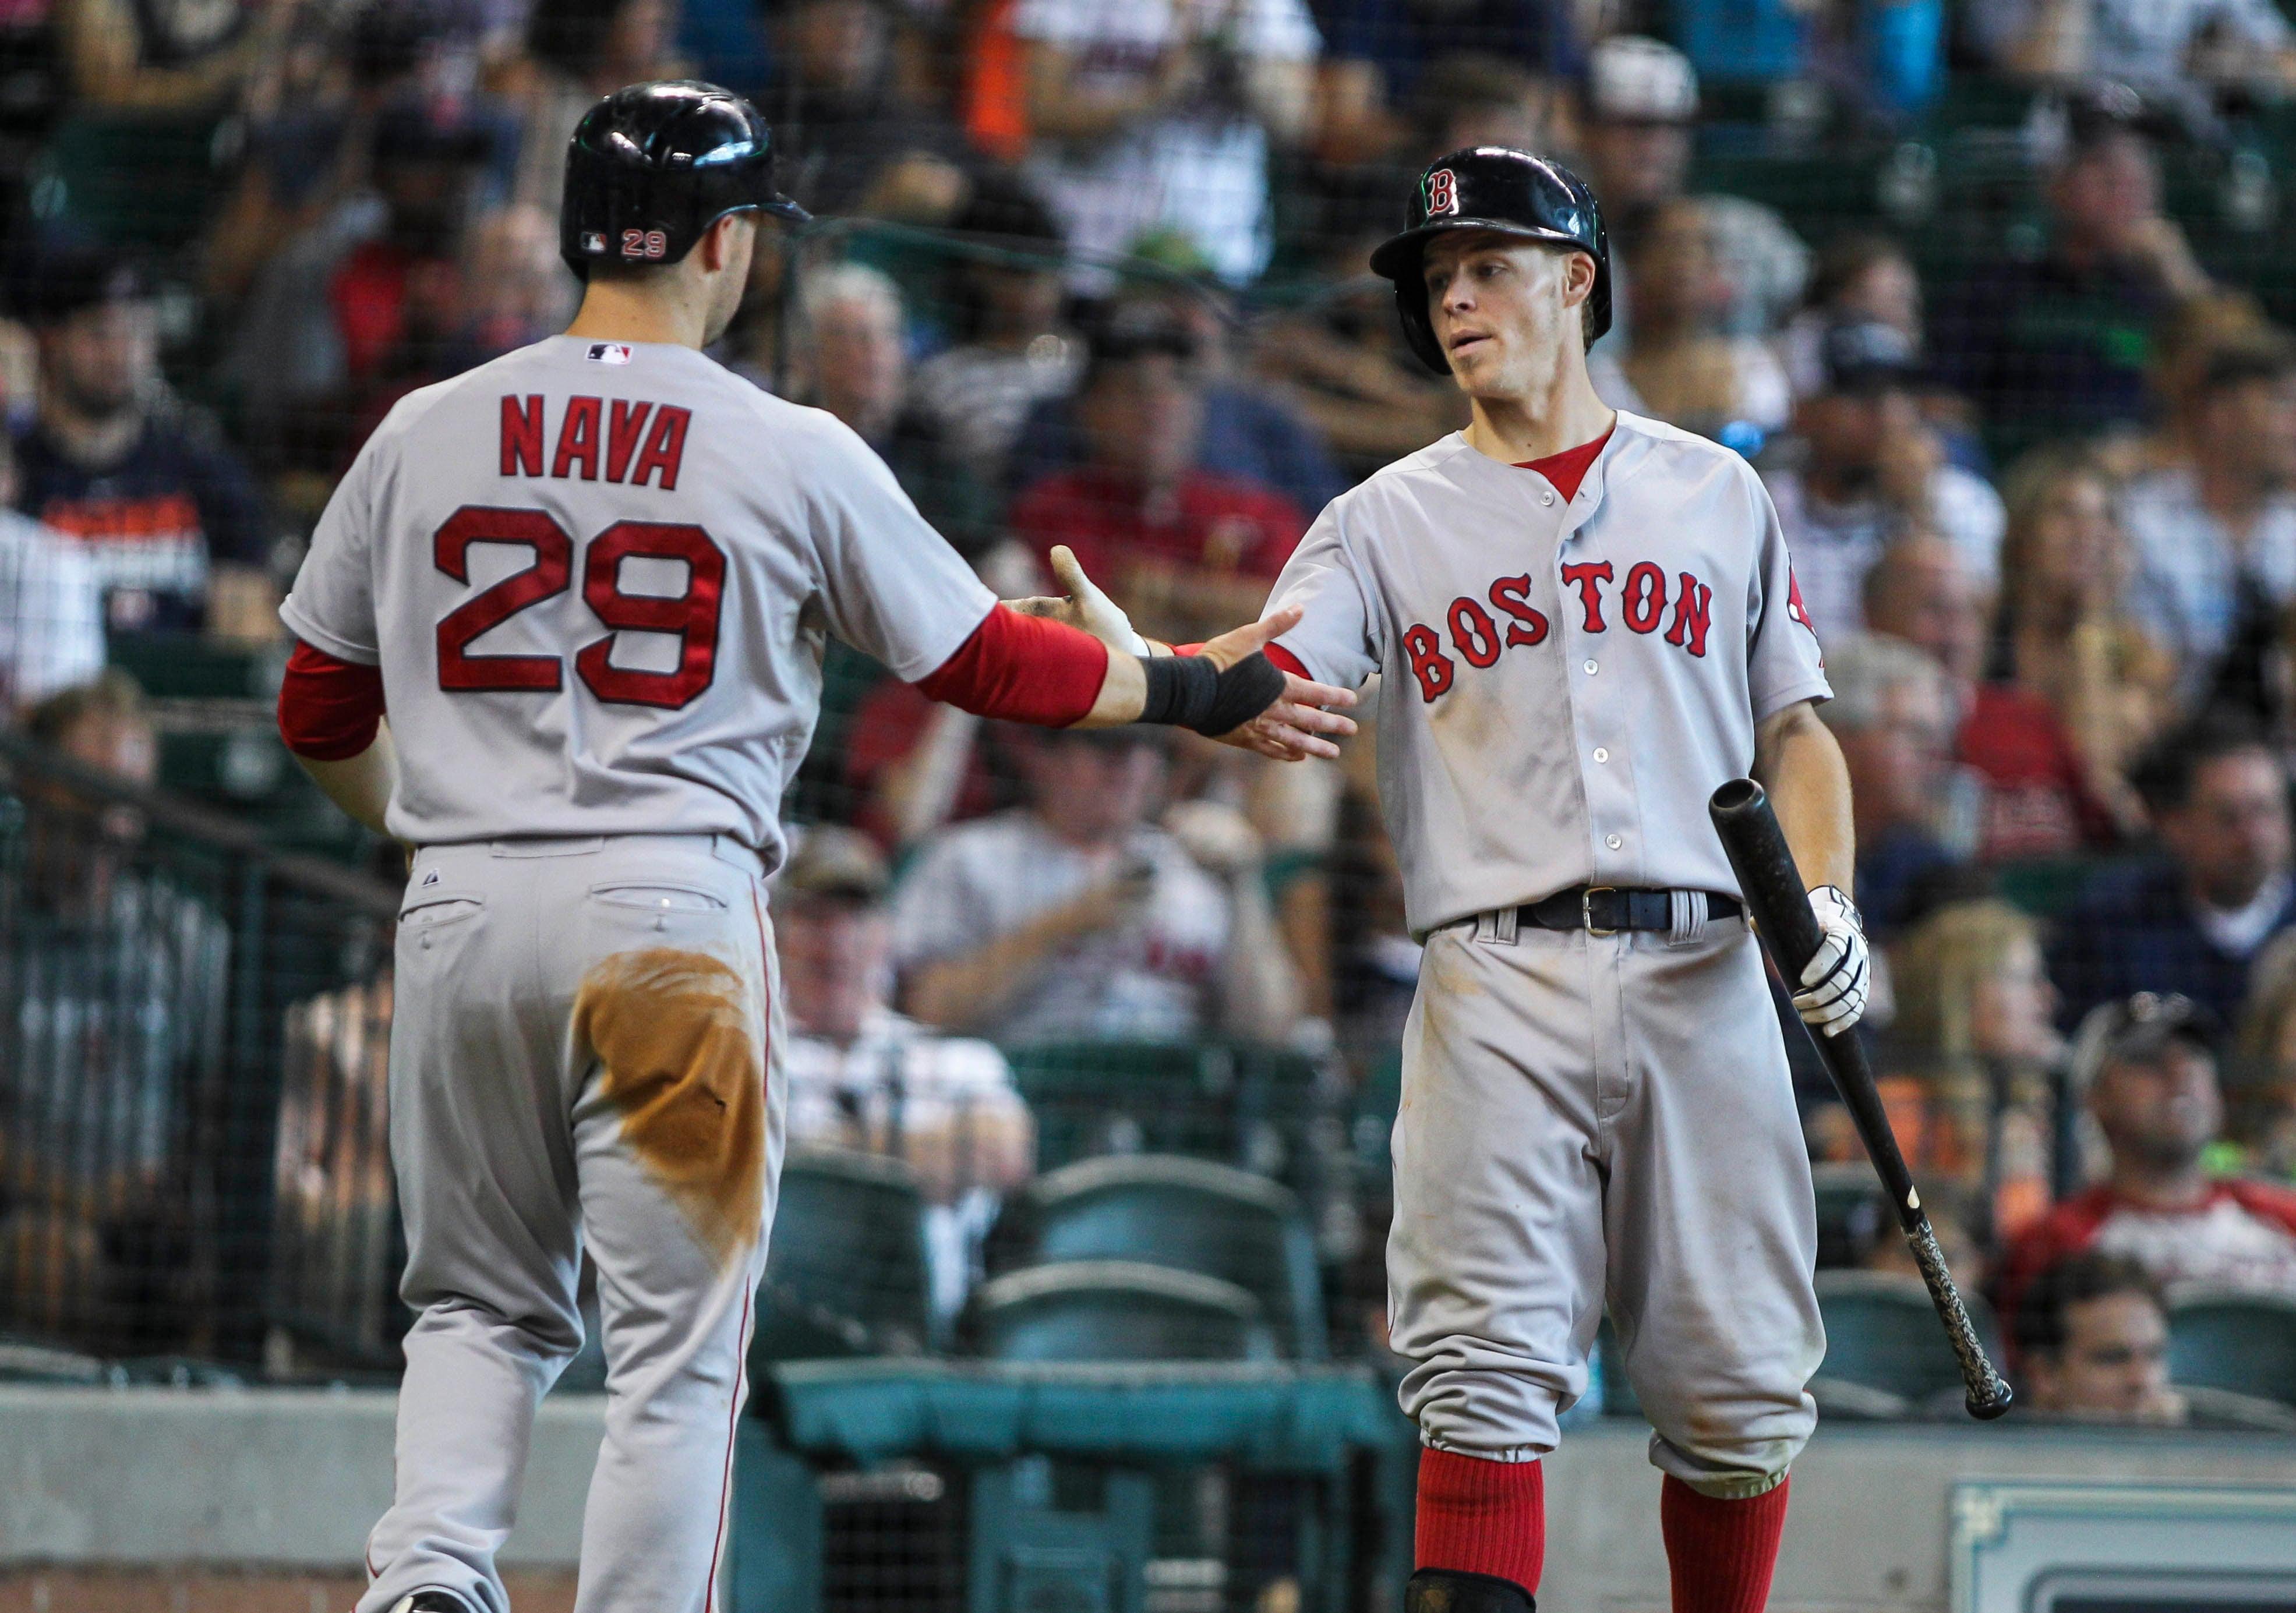 2014-07-13T211215Z_646462241_NOCID_RTRMADP_3_MLB-BOSTON-RED-SOX-AT-HOUSTON-ASTROS.jpg